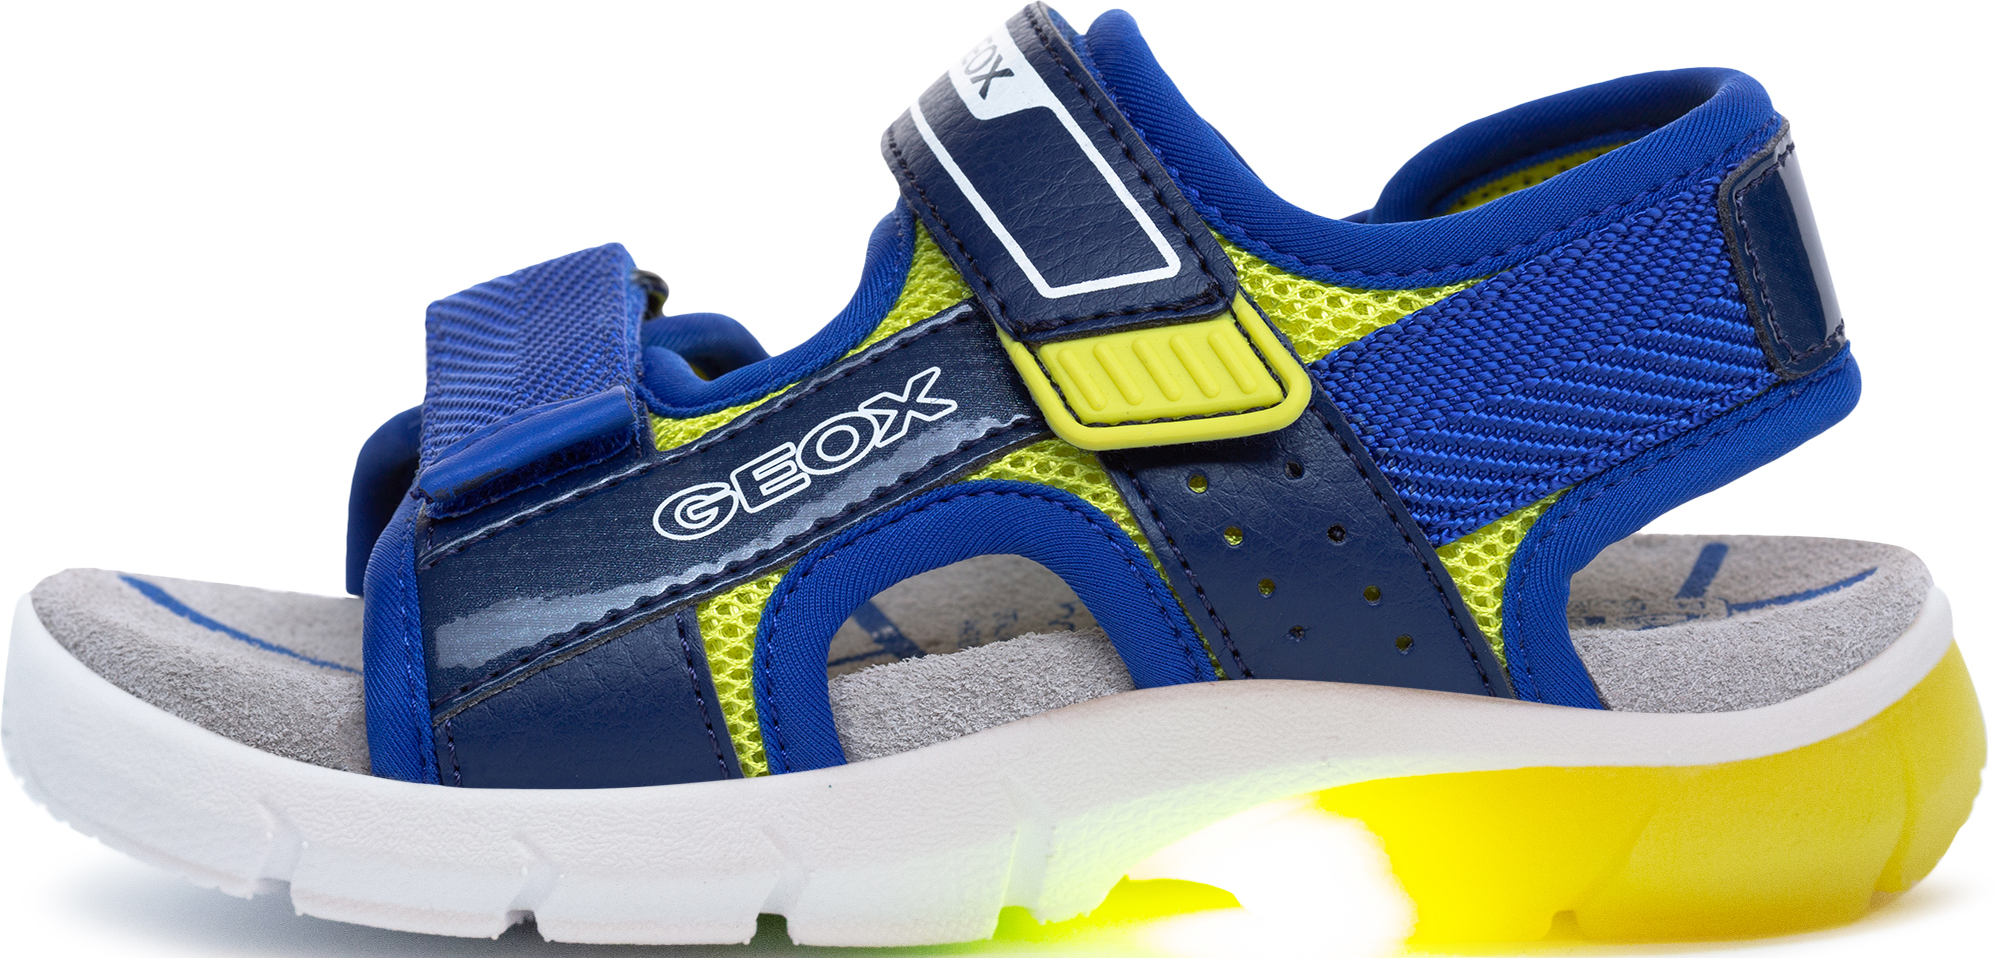 Geox Сандалии для мальчиков Flexyper, размер 34